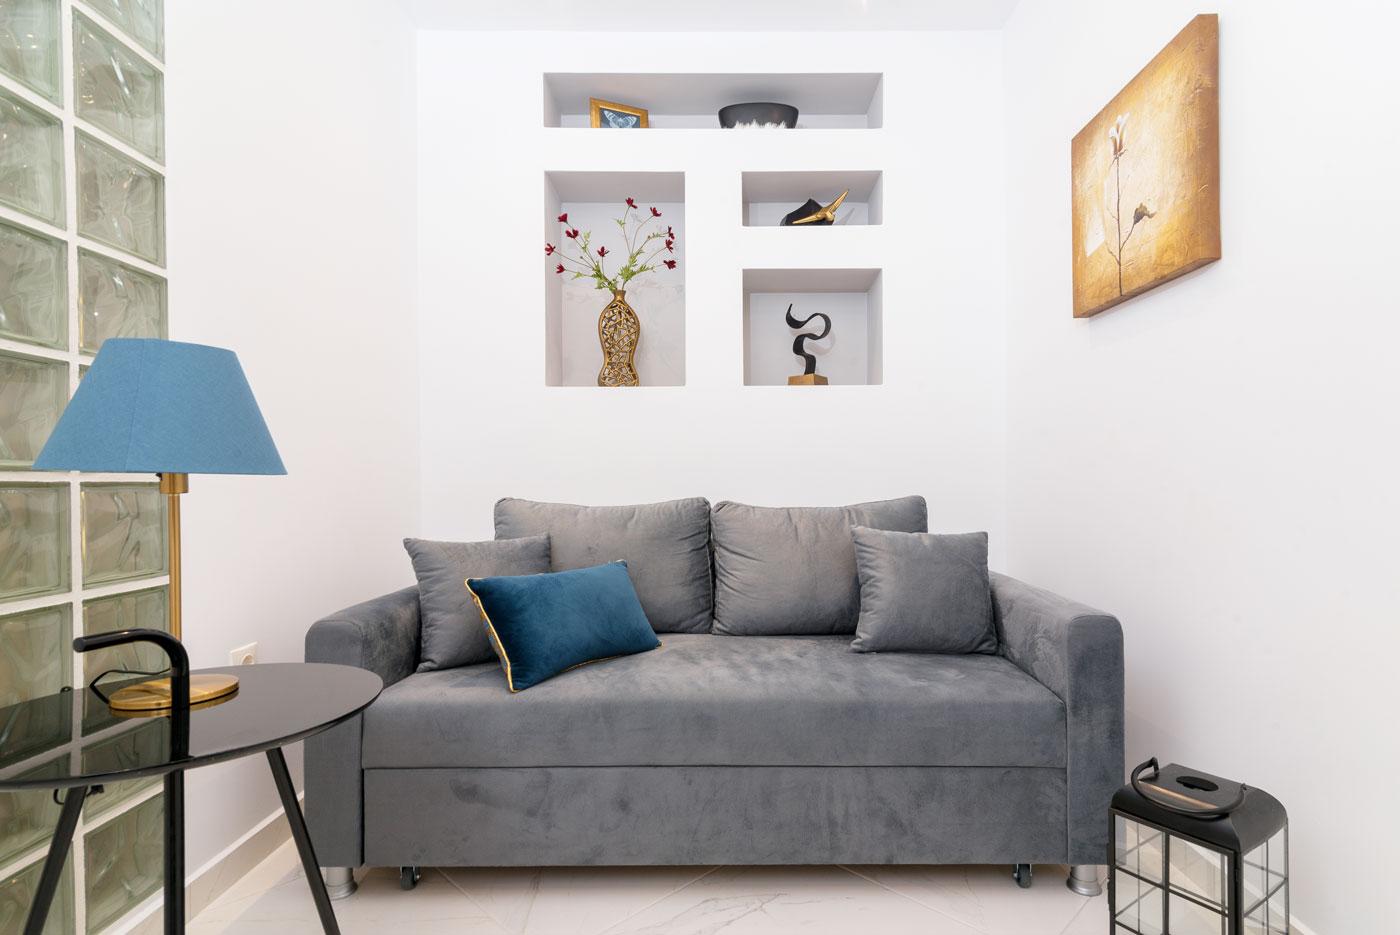 Heloni-Apartment-Lyto-1400x935-23.jpg